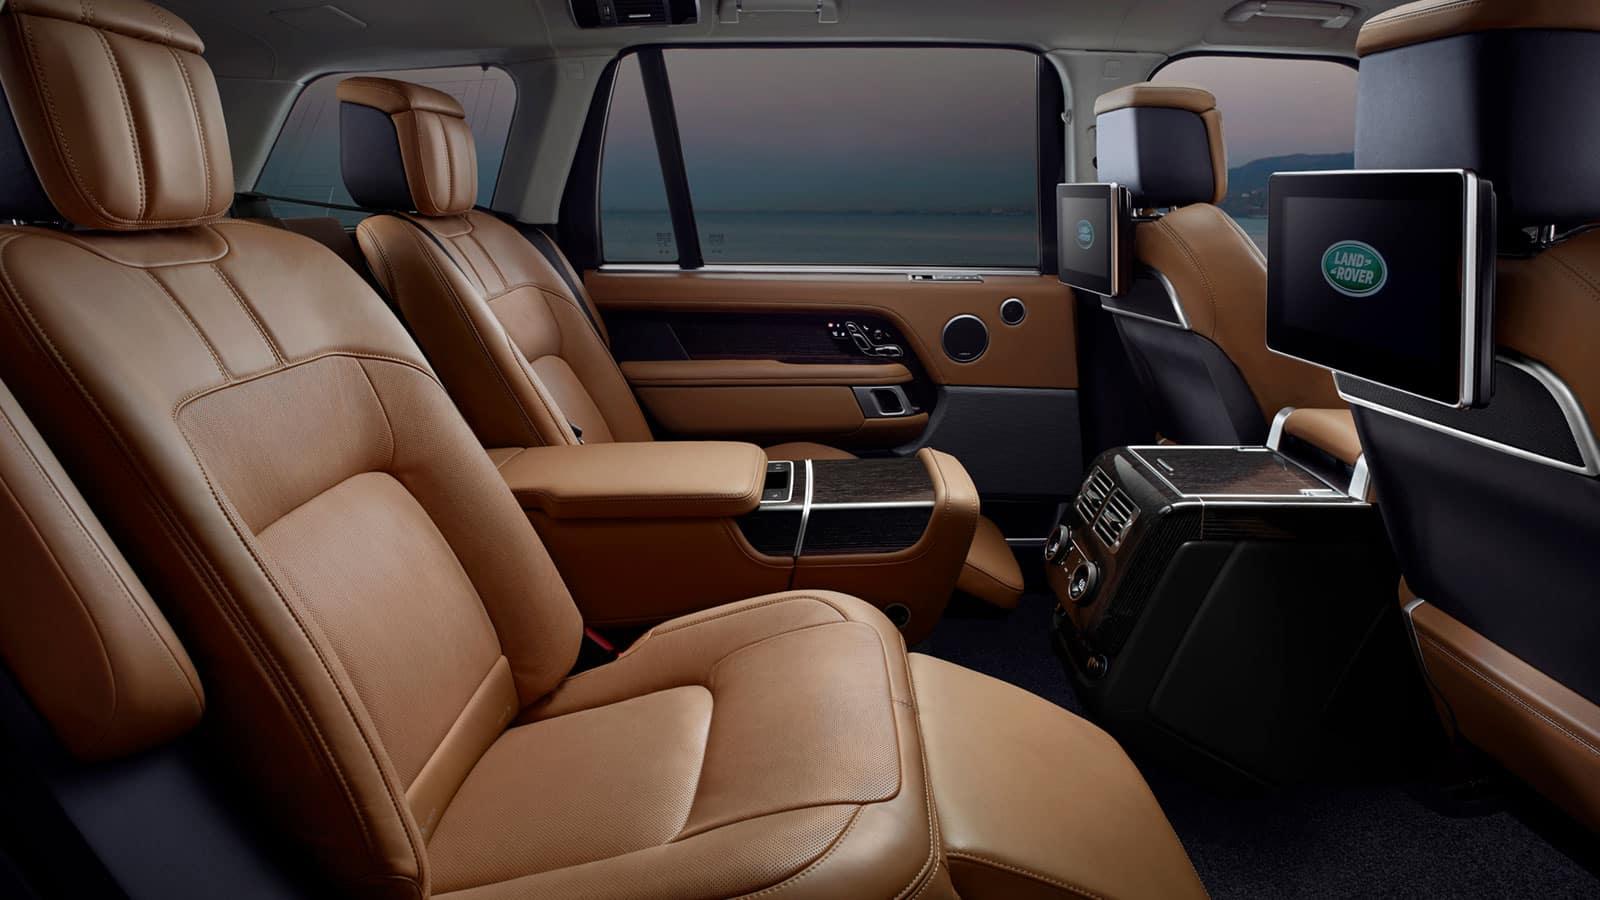 2019 Land Rover Range Rover Interior Luxury Suv Features Freeport